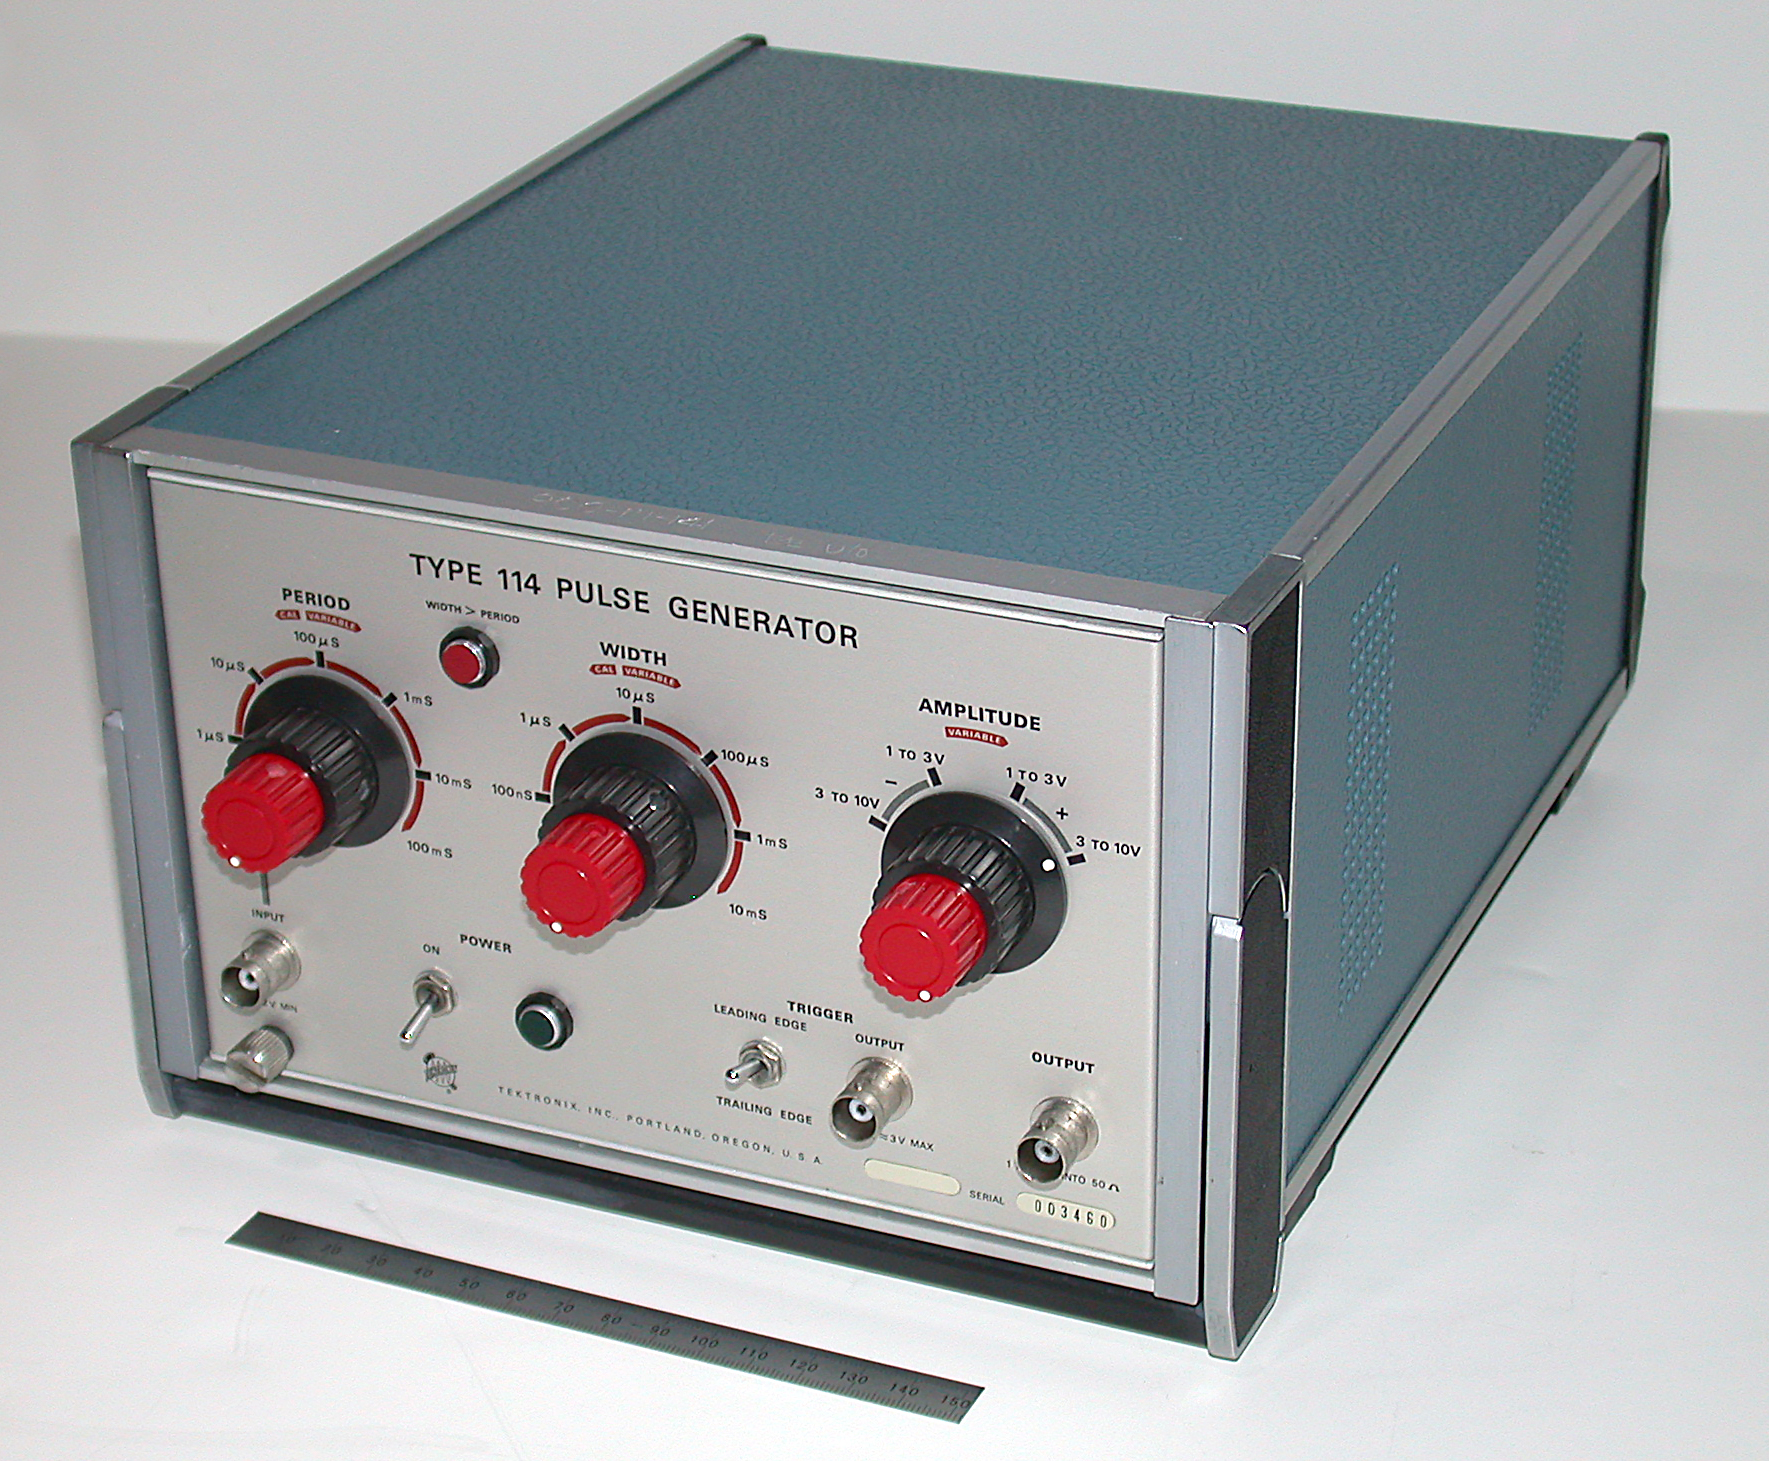 Tektronix Type 114 Pulse Generator Repair